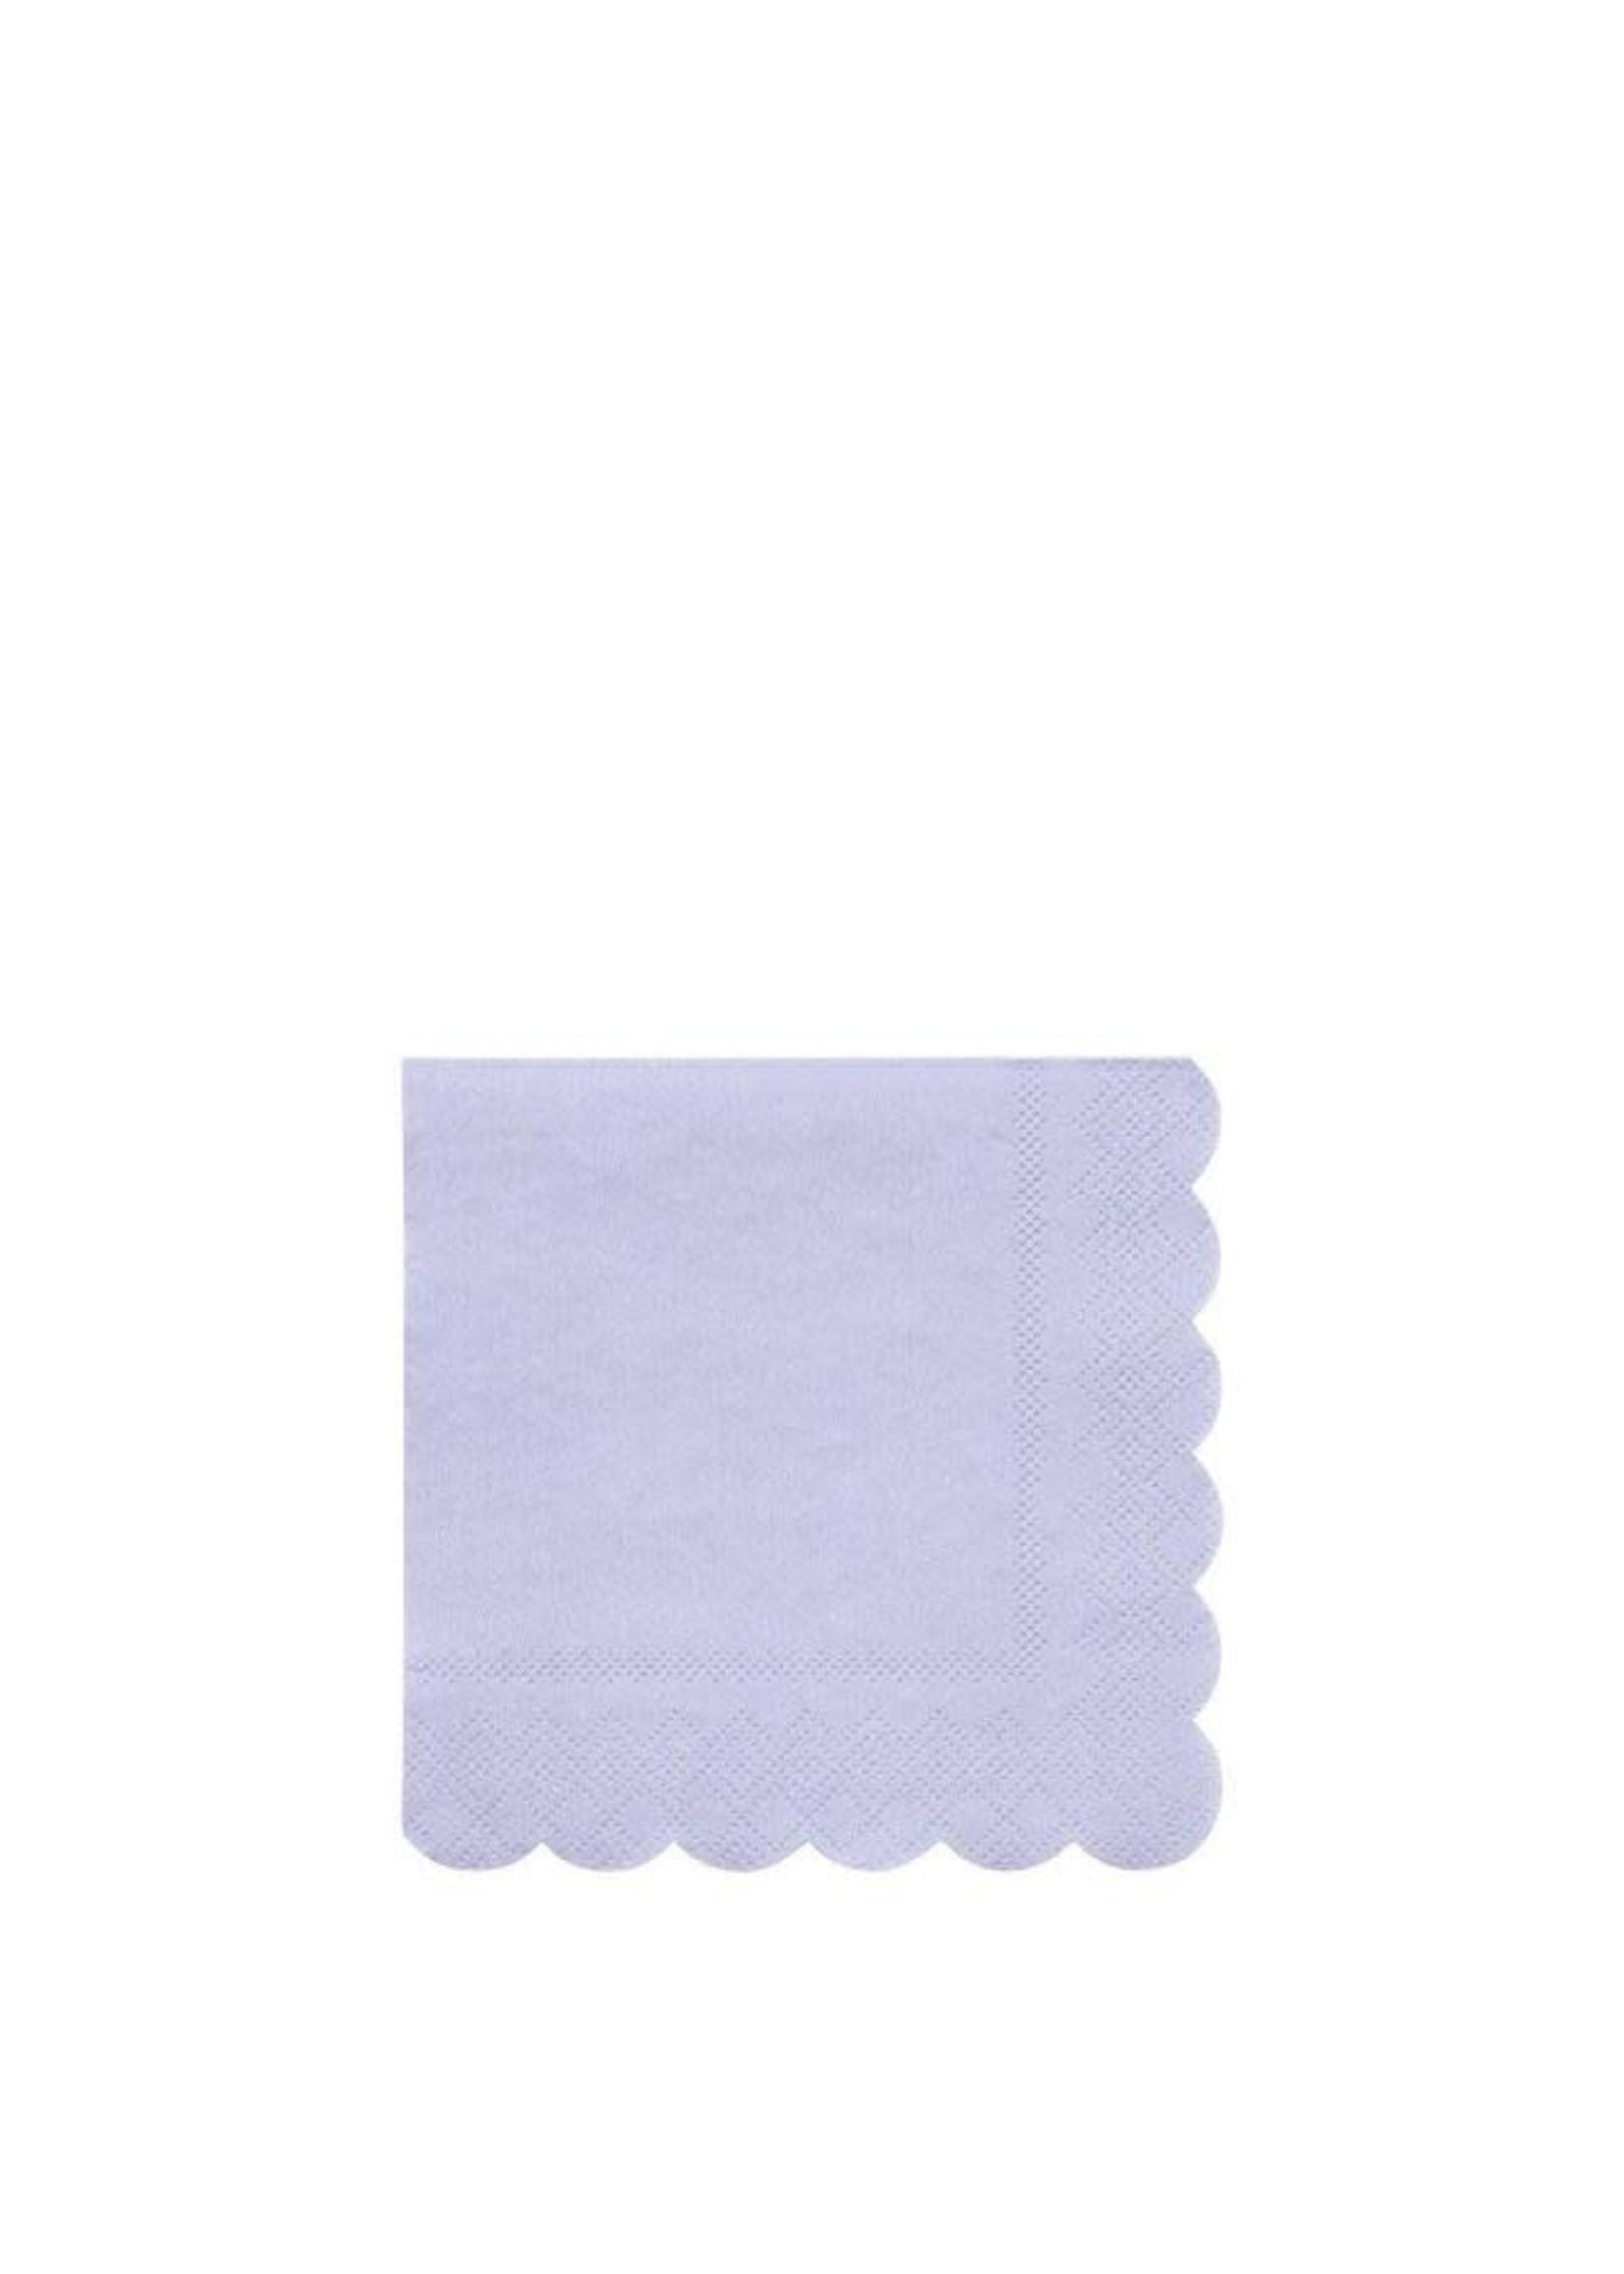 Meri Meri Paper Napkin - Pale Blue Small